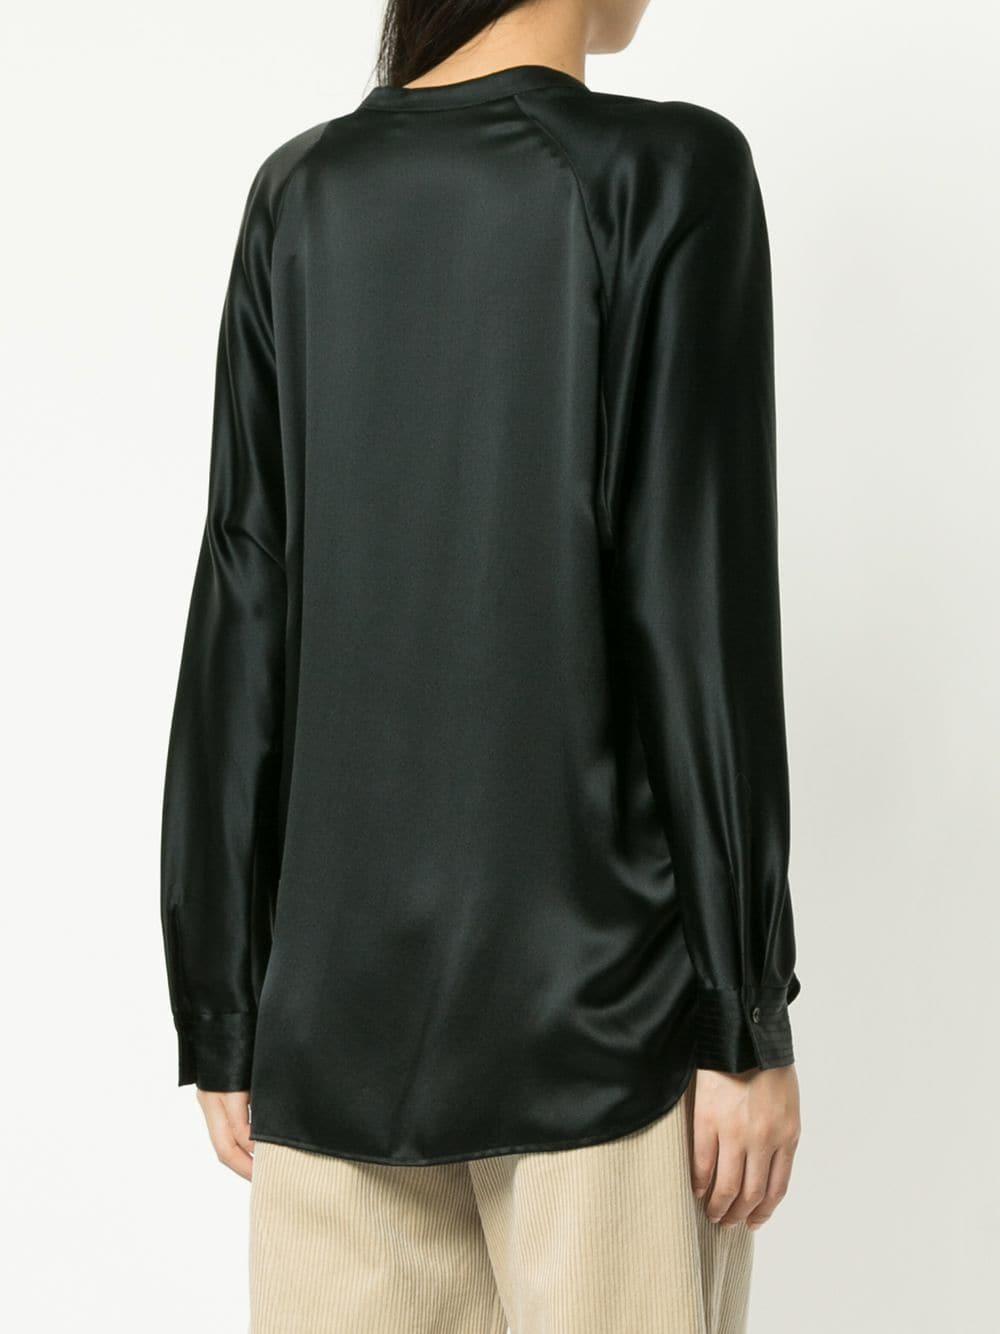 7621b5a85ec38 Lyst - Vince Loose-fit Blouse in Black